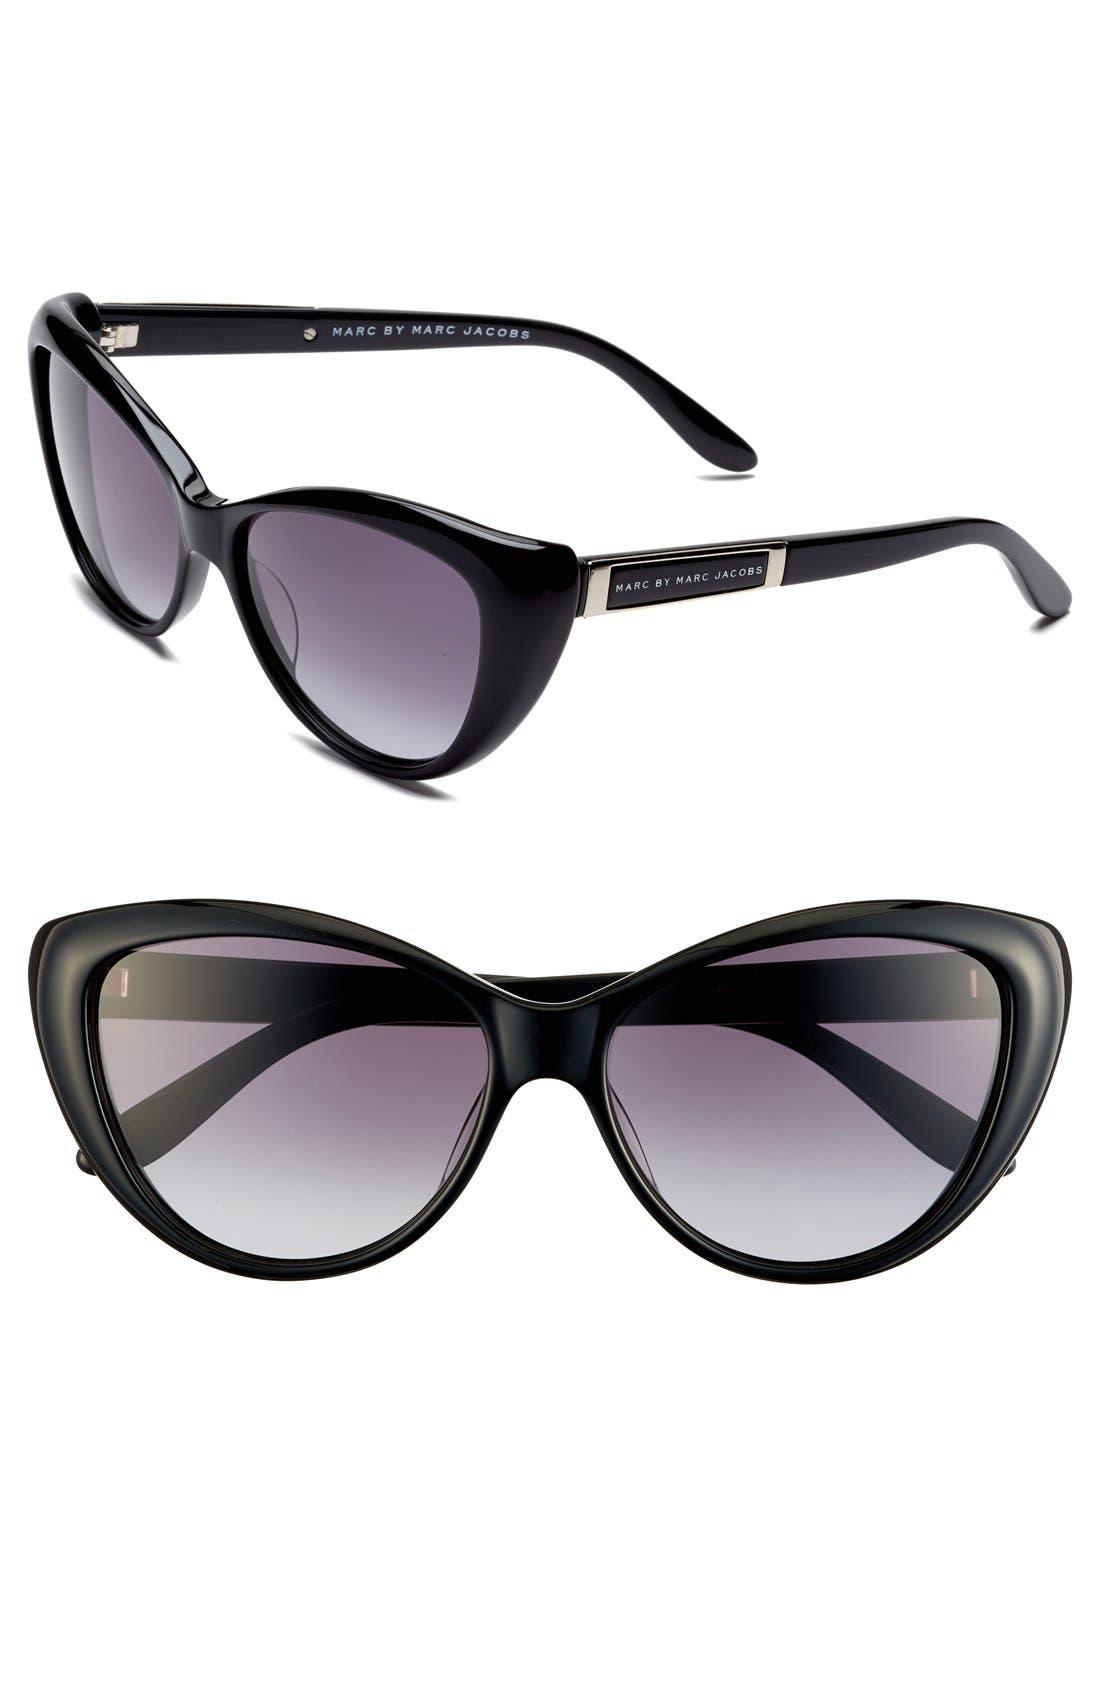 56mm Cat Eye Sunglasses,                         Main,                         color, Shiny Black/ Grey Gradient